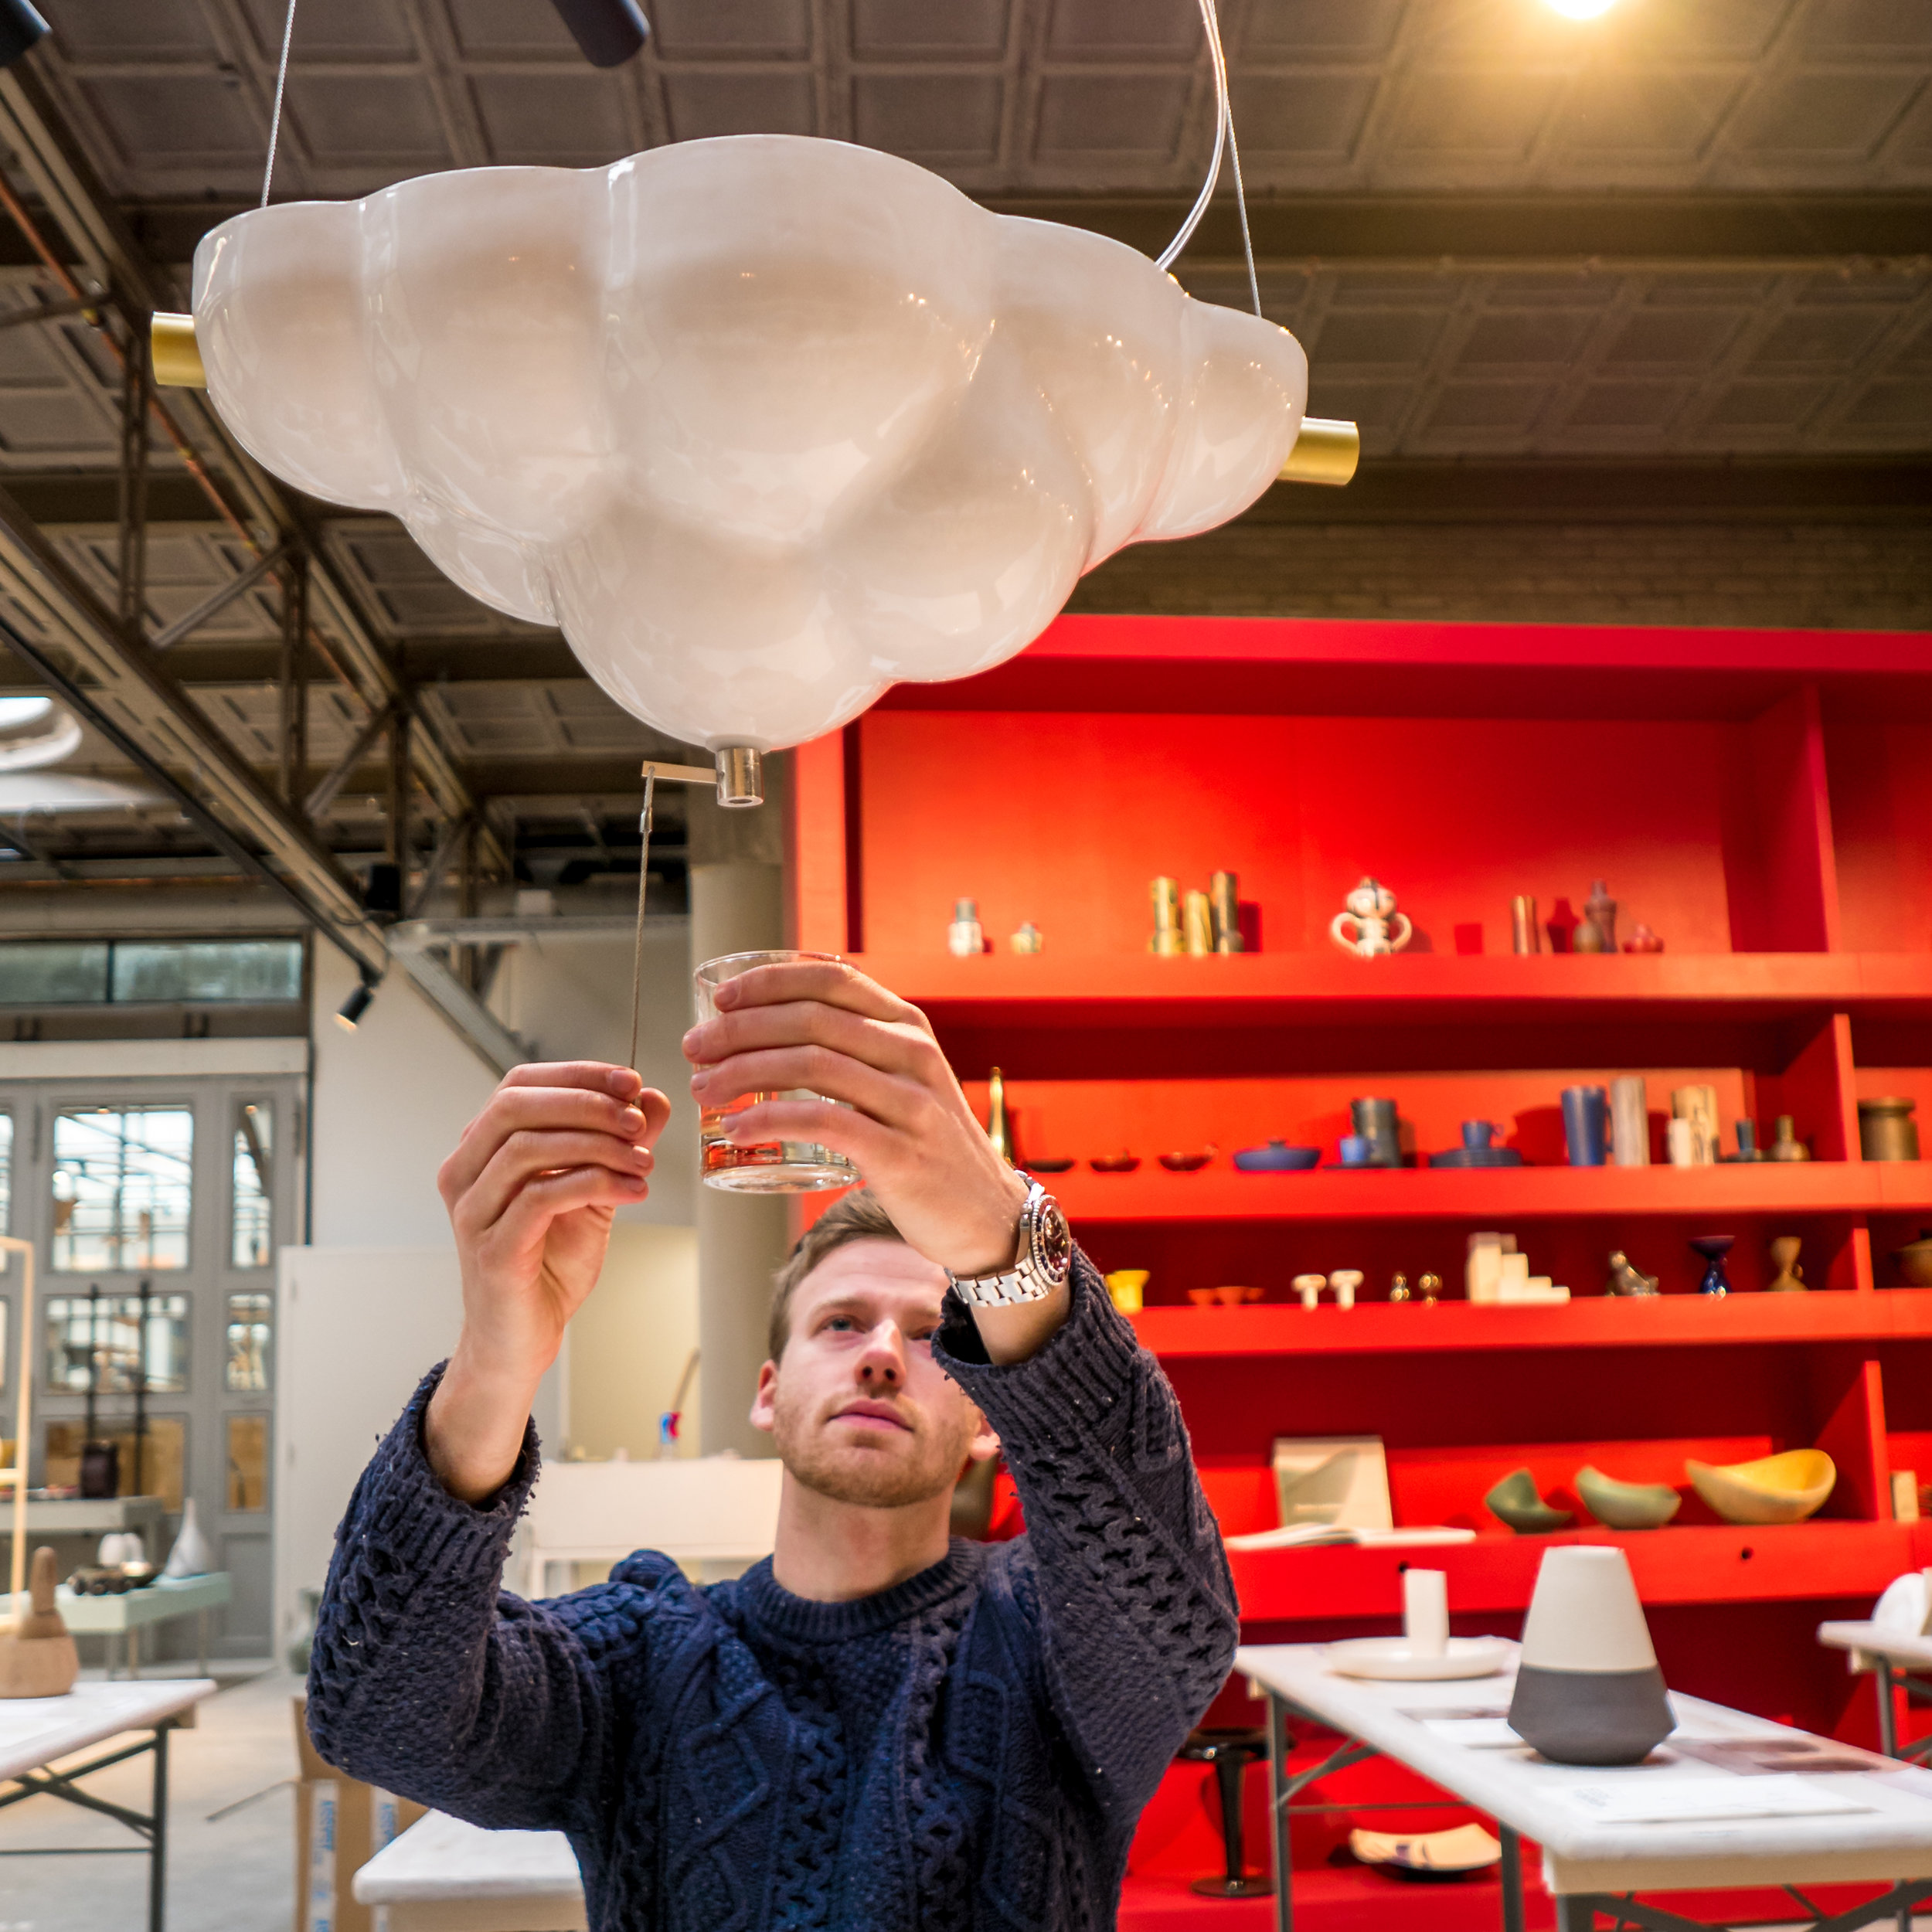 The Cloud by George Barratt-Jones